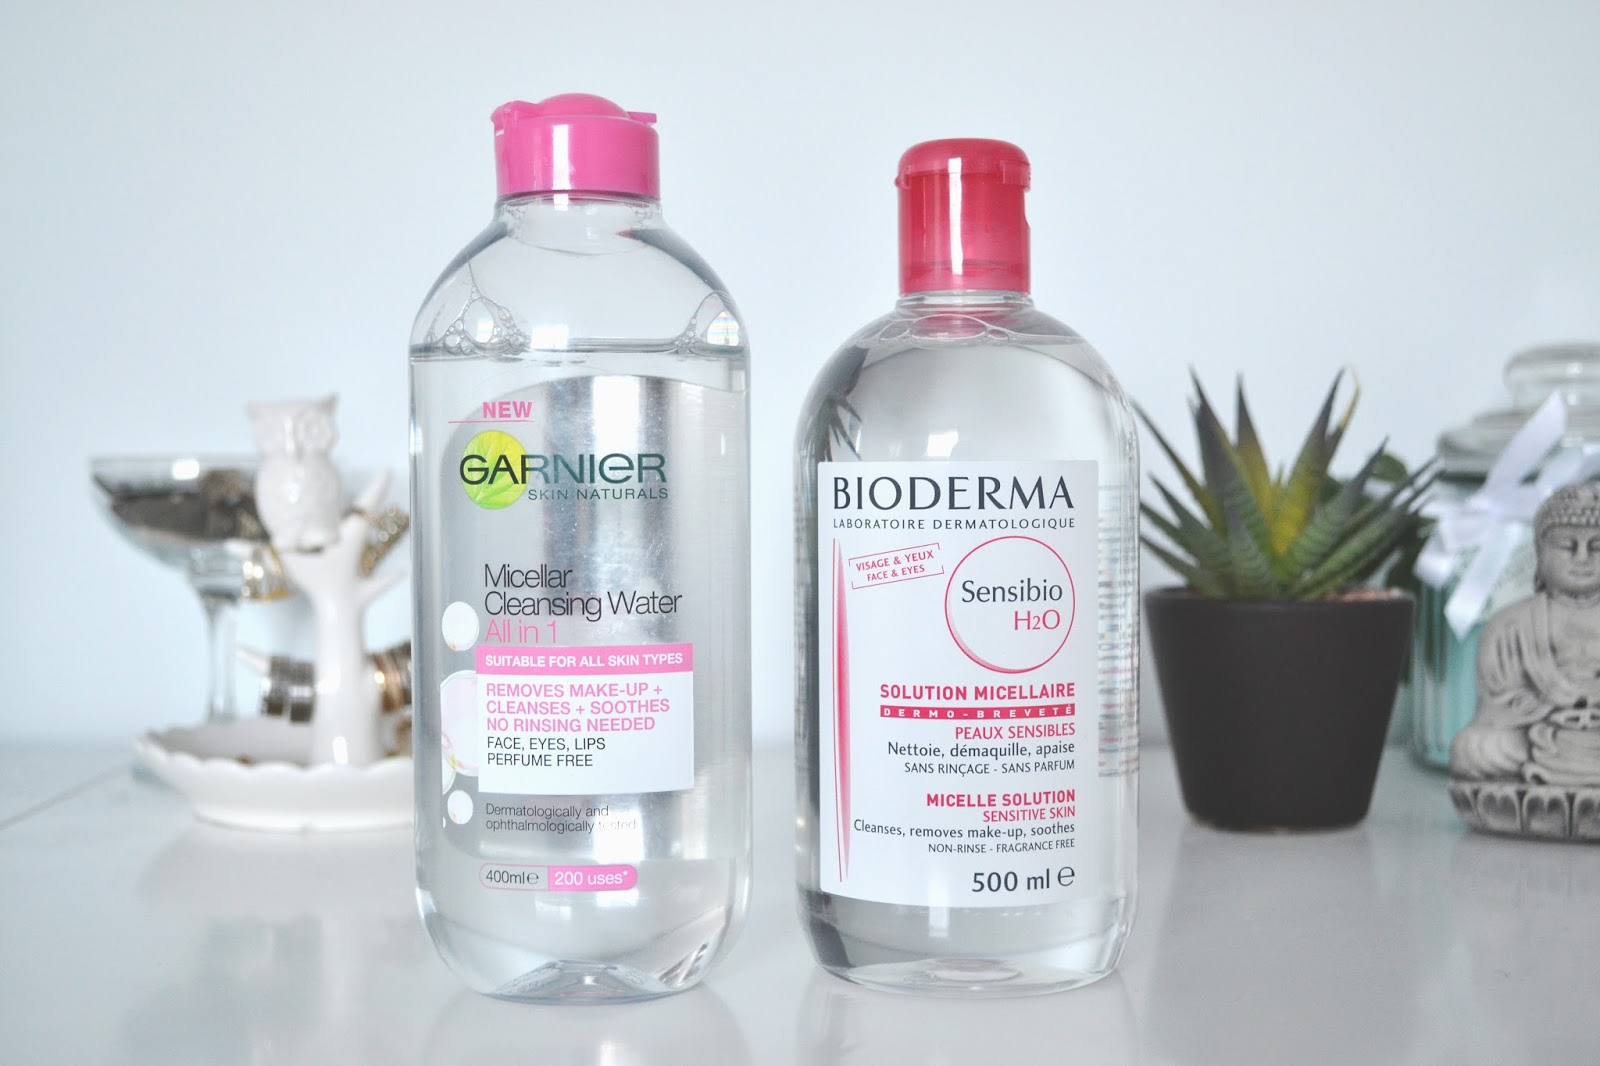 rêveriebelle beauty blog: Bioderma Sensibio H2O vs. Garnier ...